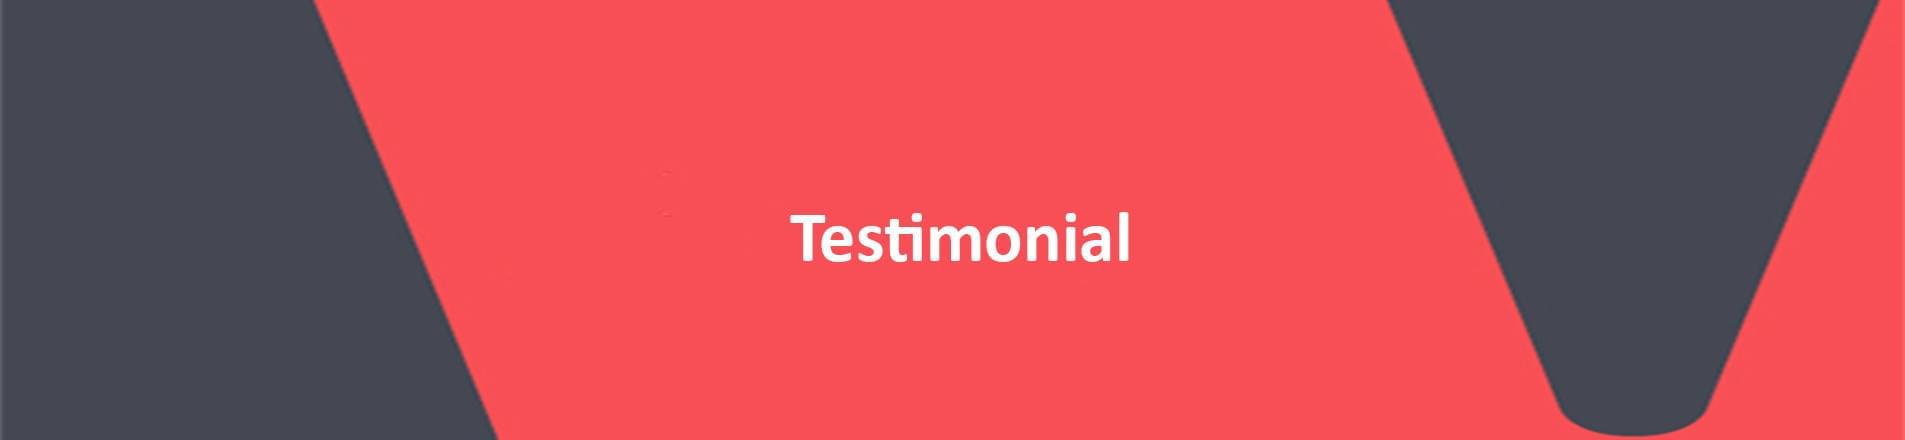 Word Testimonial on red VERCIDA branded background